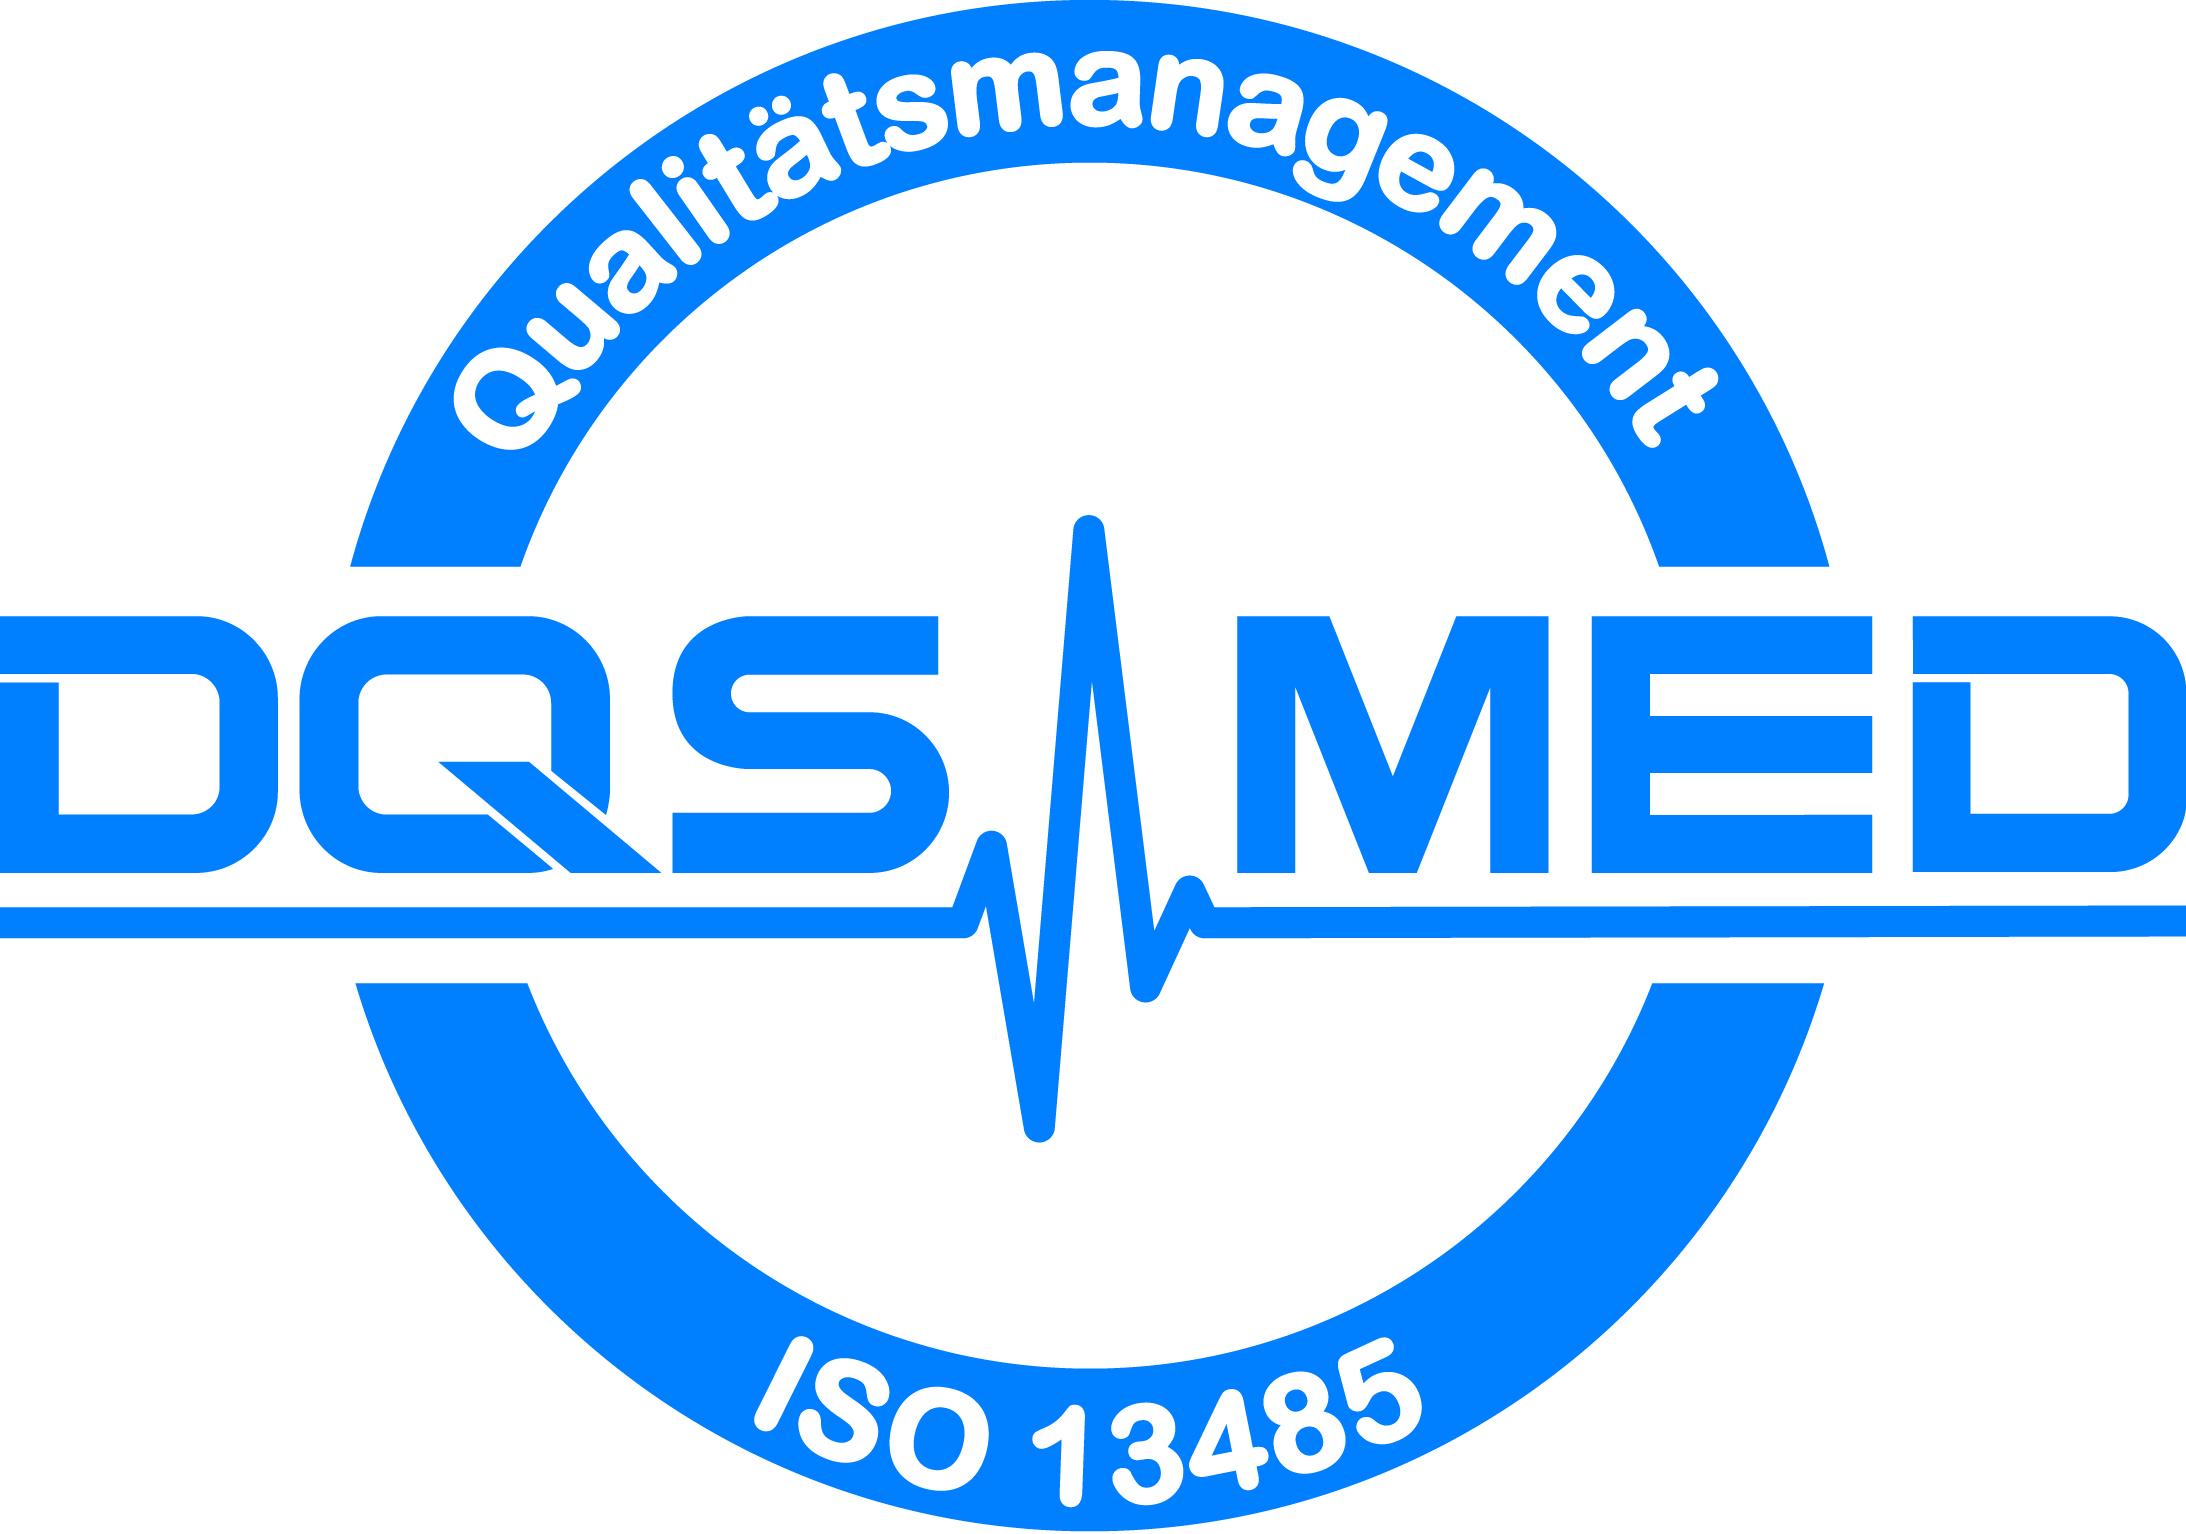 amptec internationally leading provider of rna technology products